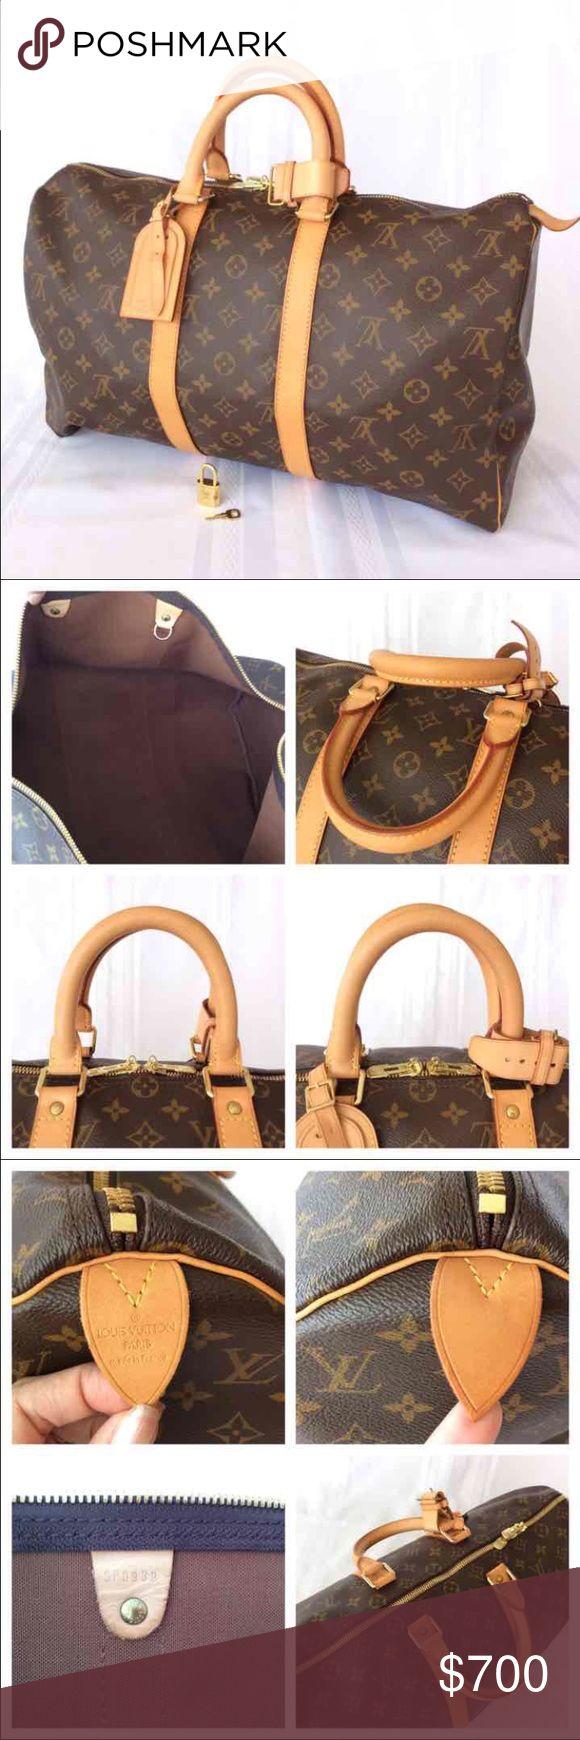 Louis Vuitton Keepall 45 Excellent condition Louis Vuitton Bags Travel Bags